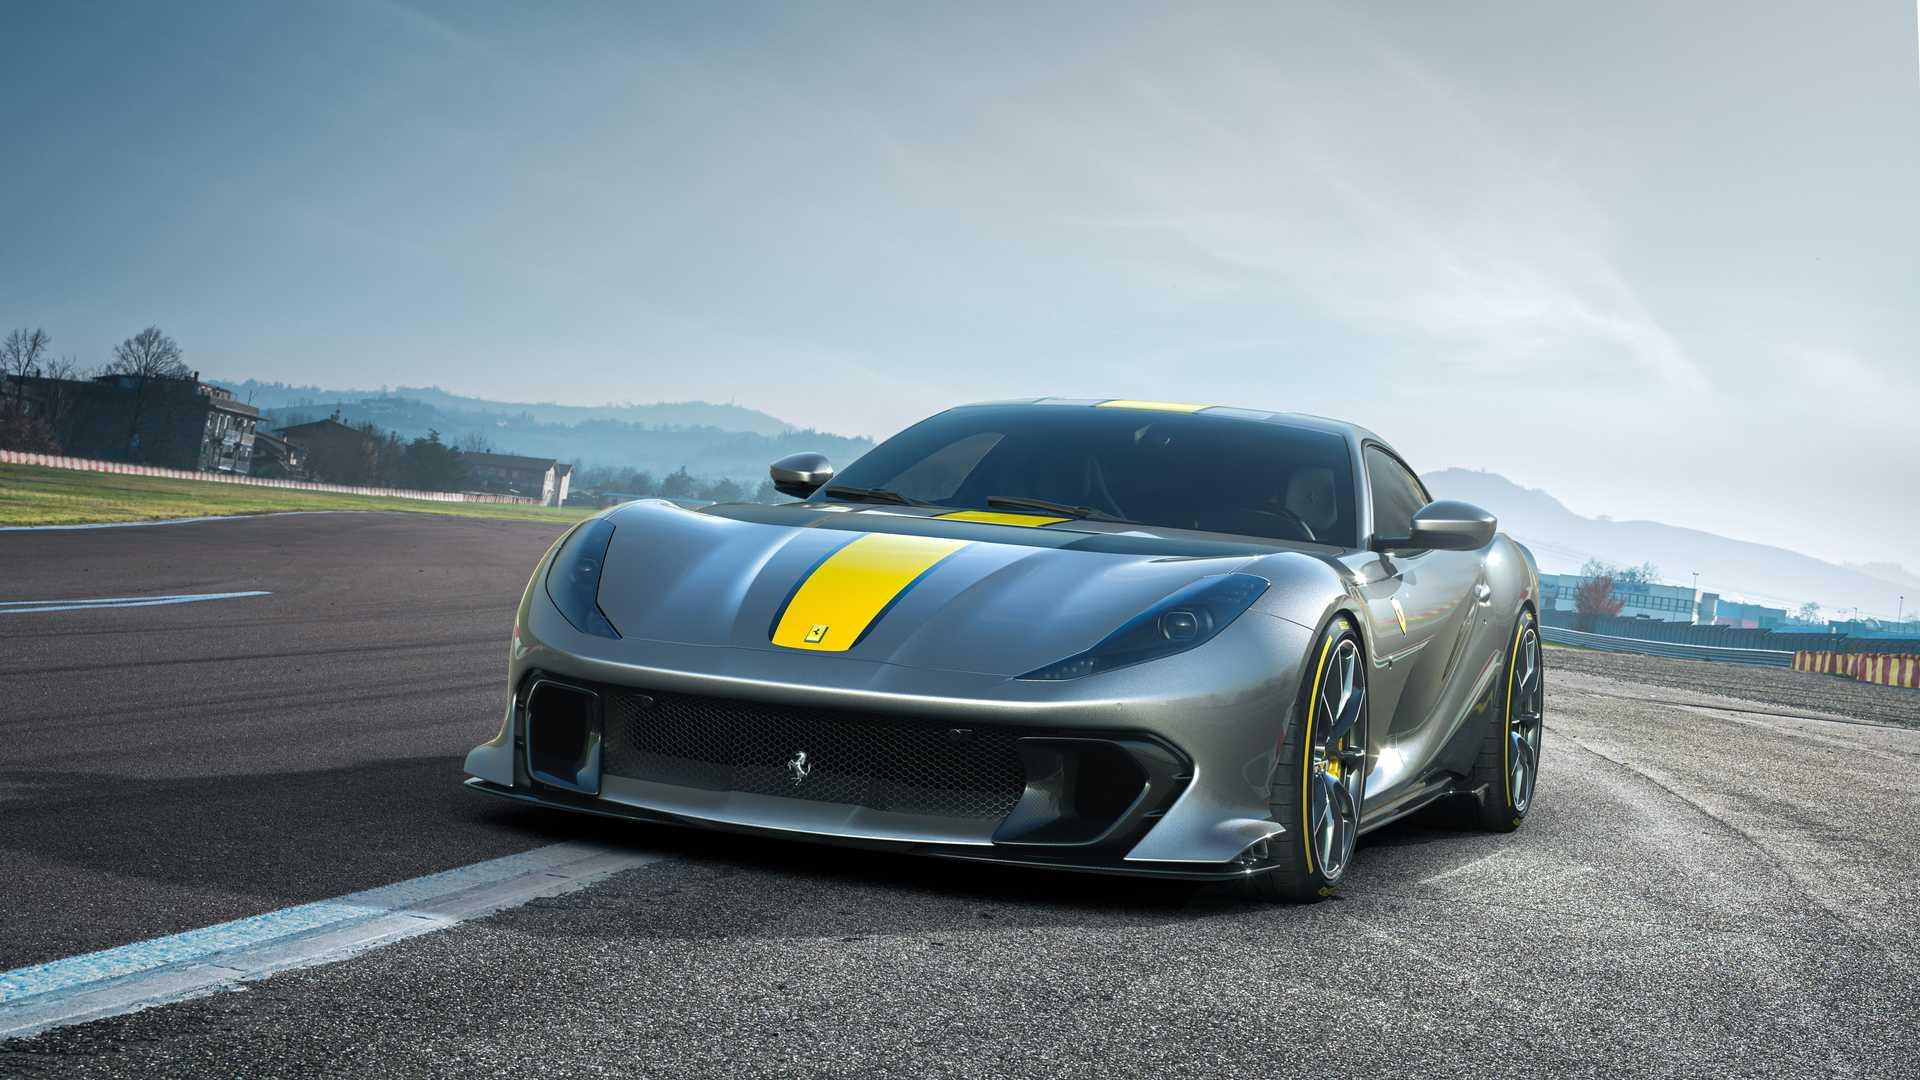 Ferrari: Παρουσίασε νέο μοντέλο αλλά κρατάει κρυφό το όνομά του! (pics)